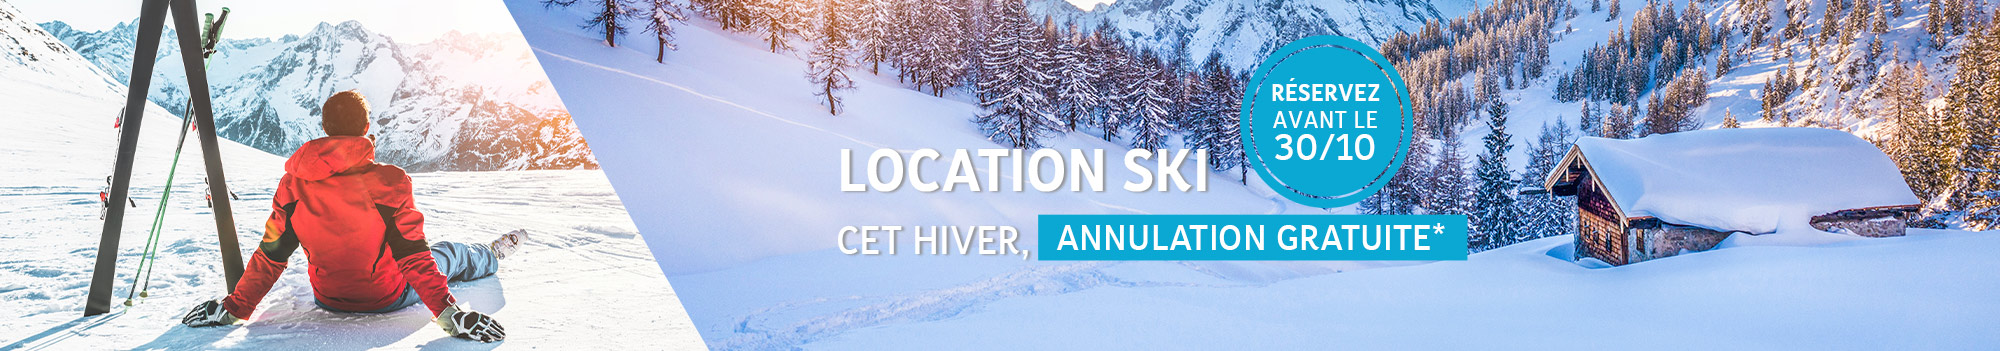 Location Ski Maeva